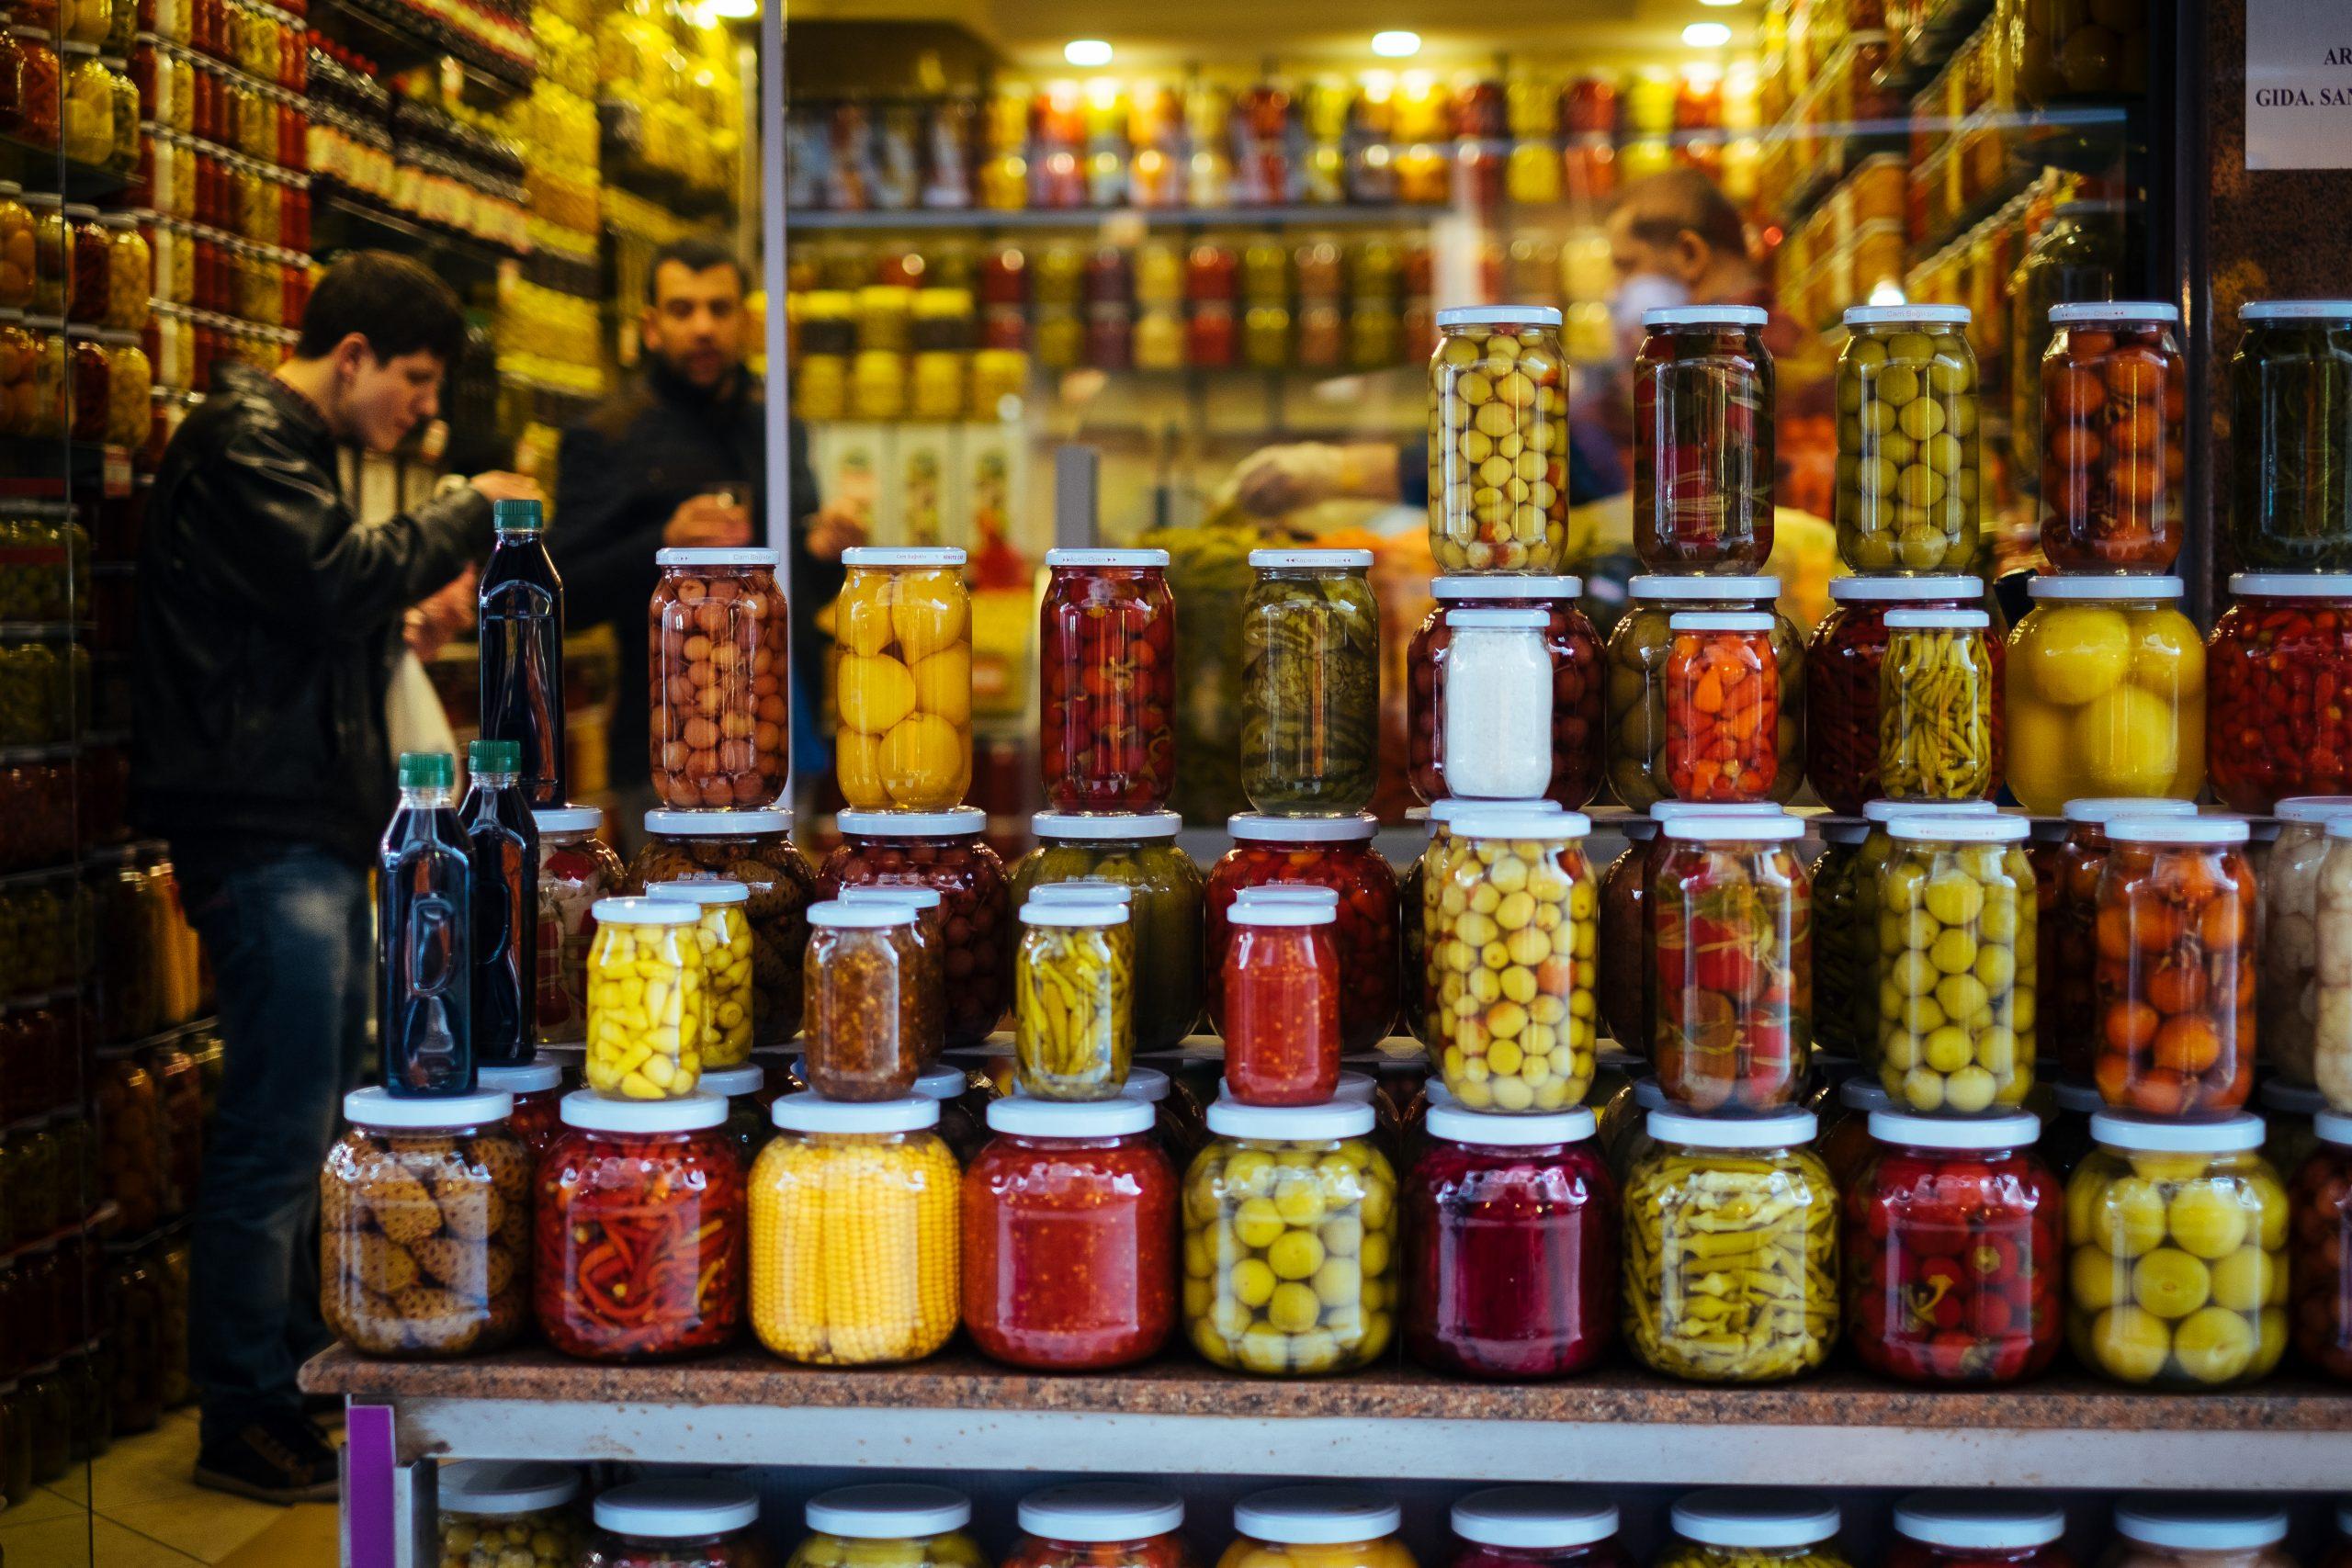 Istanbul: ingemaakte zaken in Beyoglu